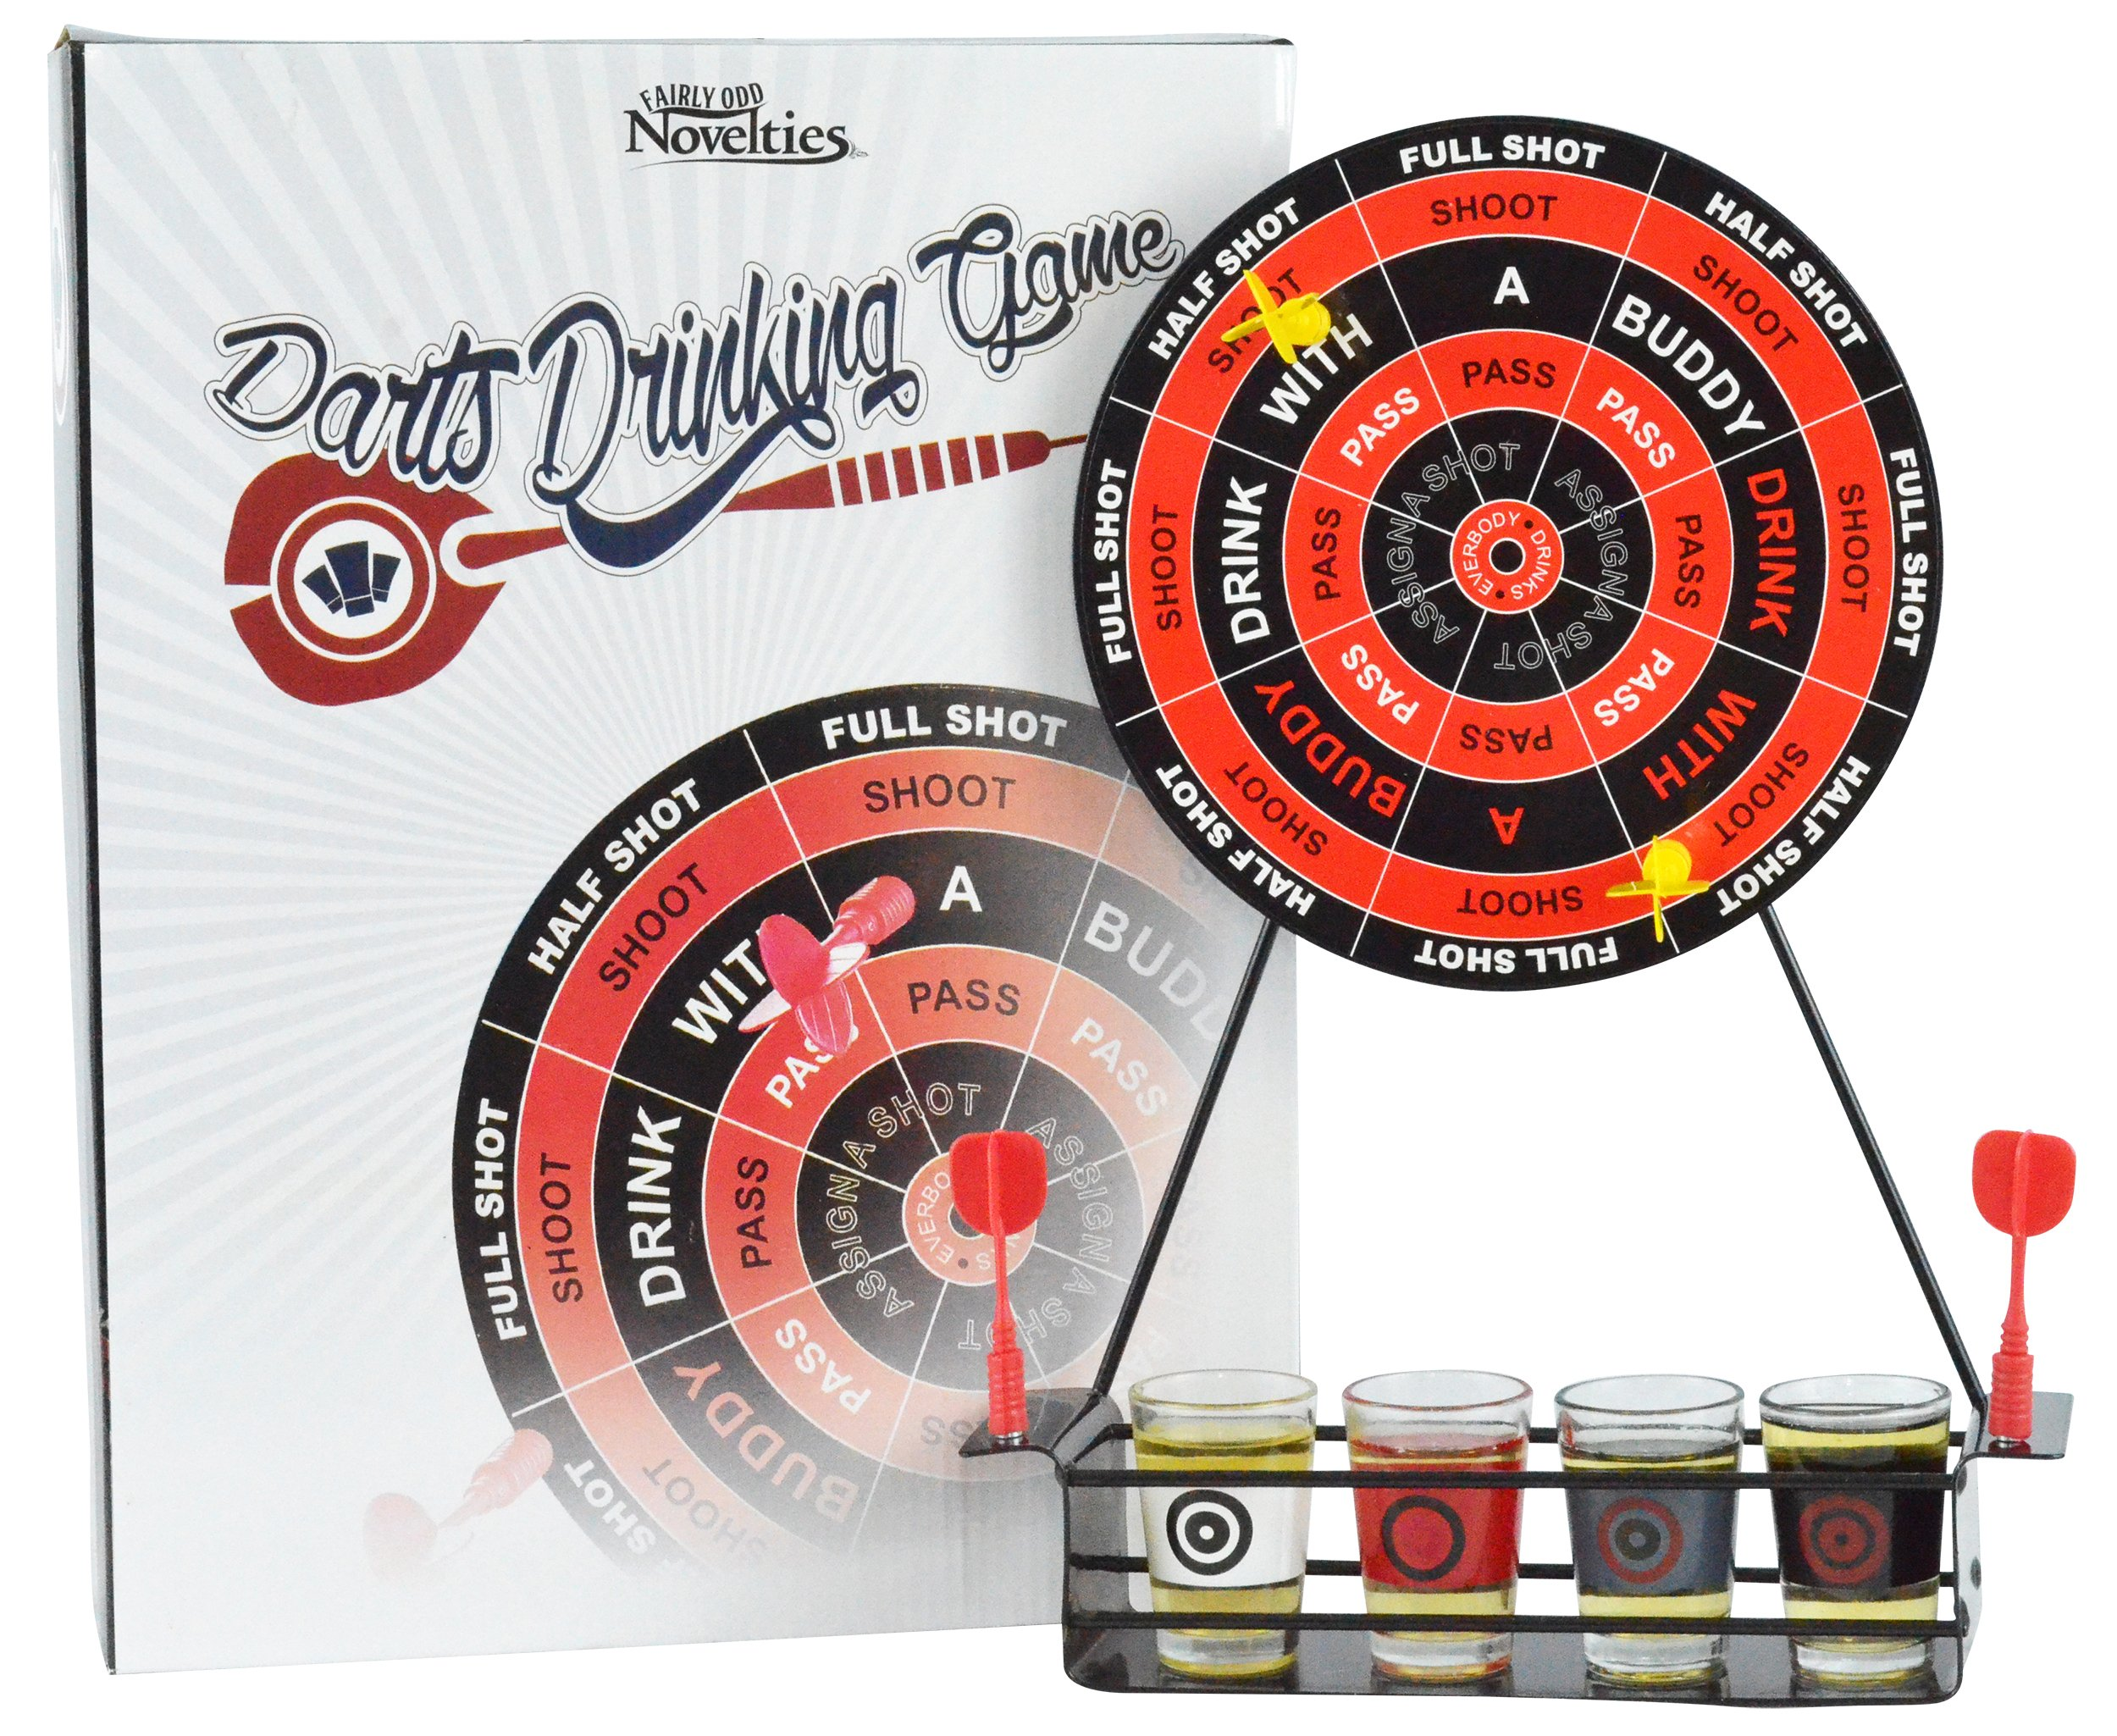 Fairly Odd Novelties Darts Shots Novelty Drinking Game, Black